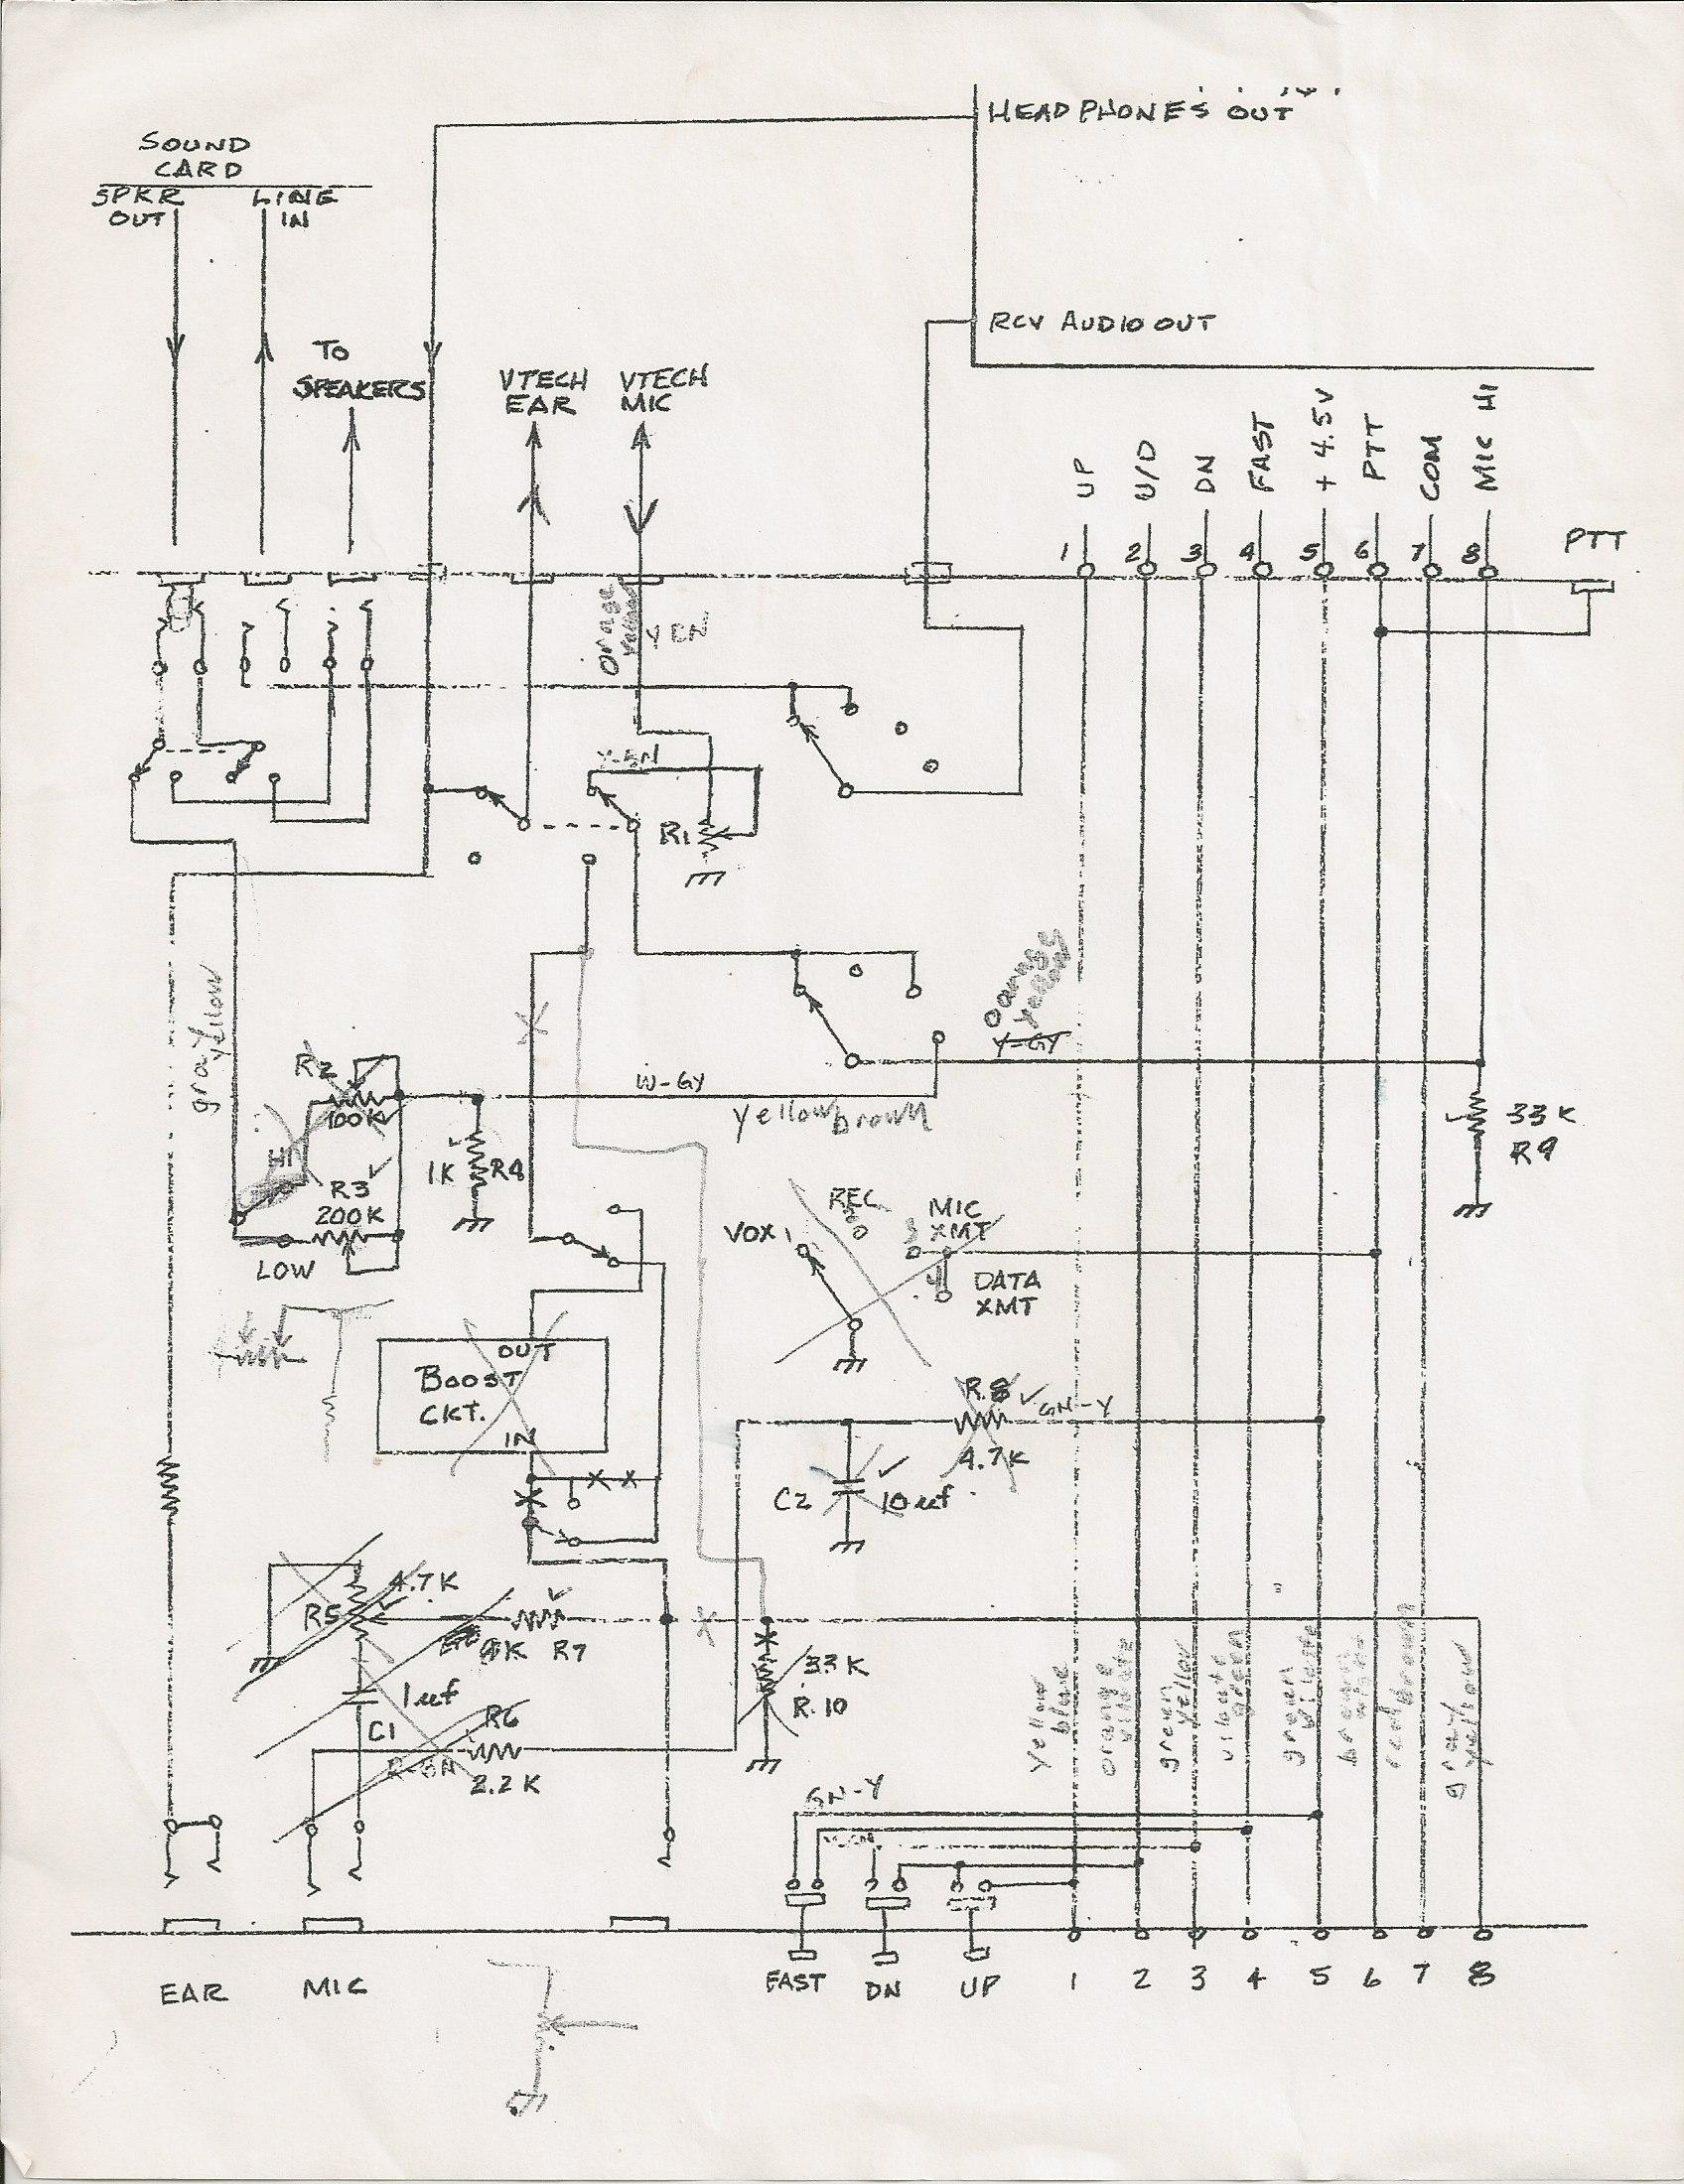 Radio Audio Interface Unit